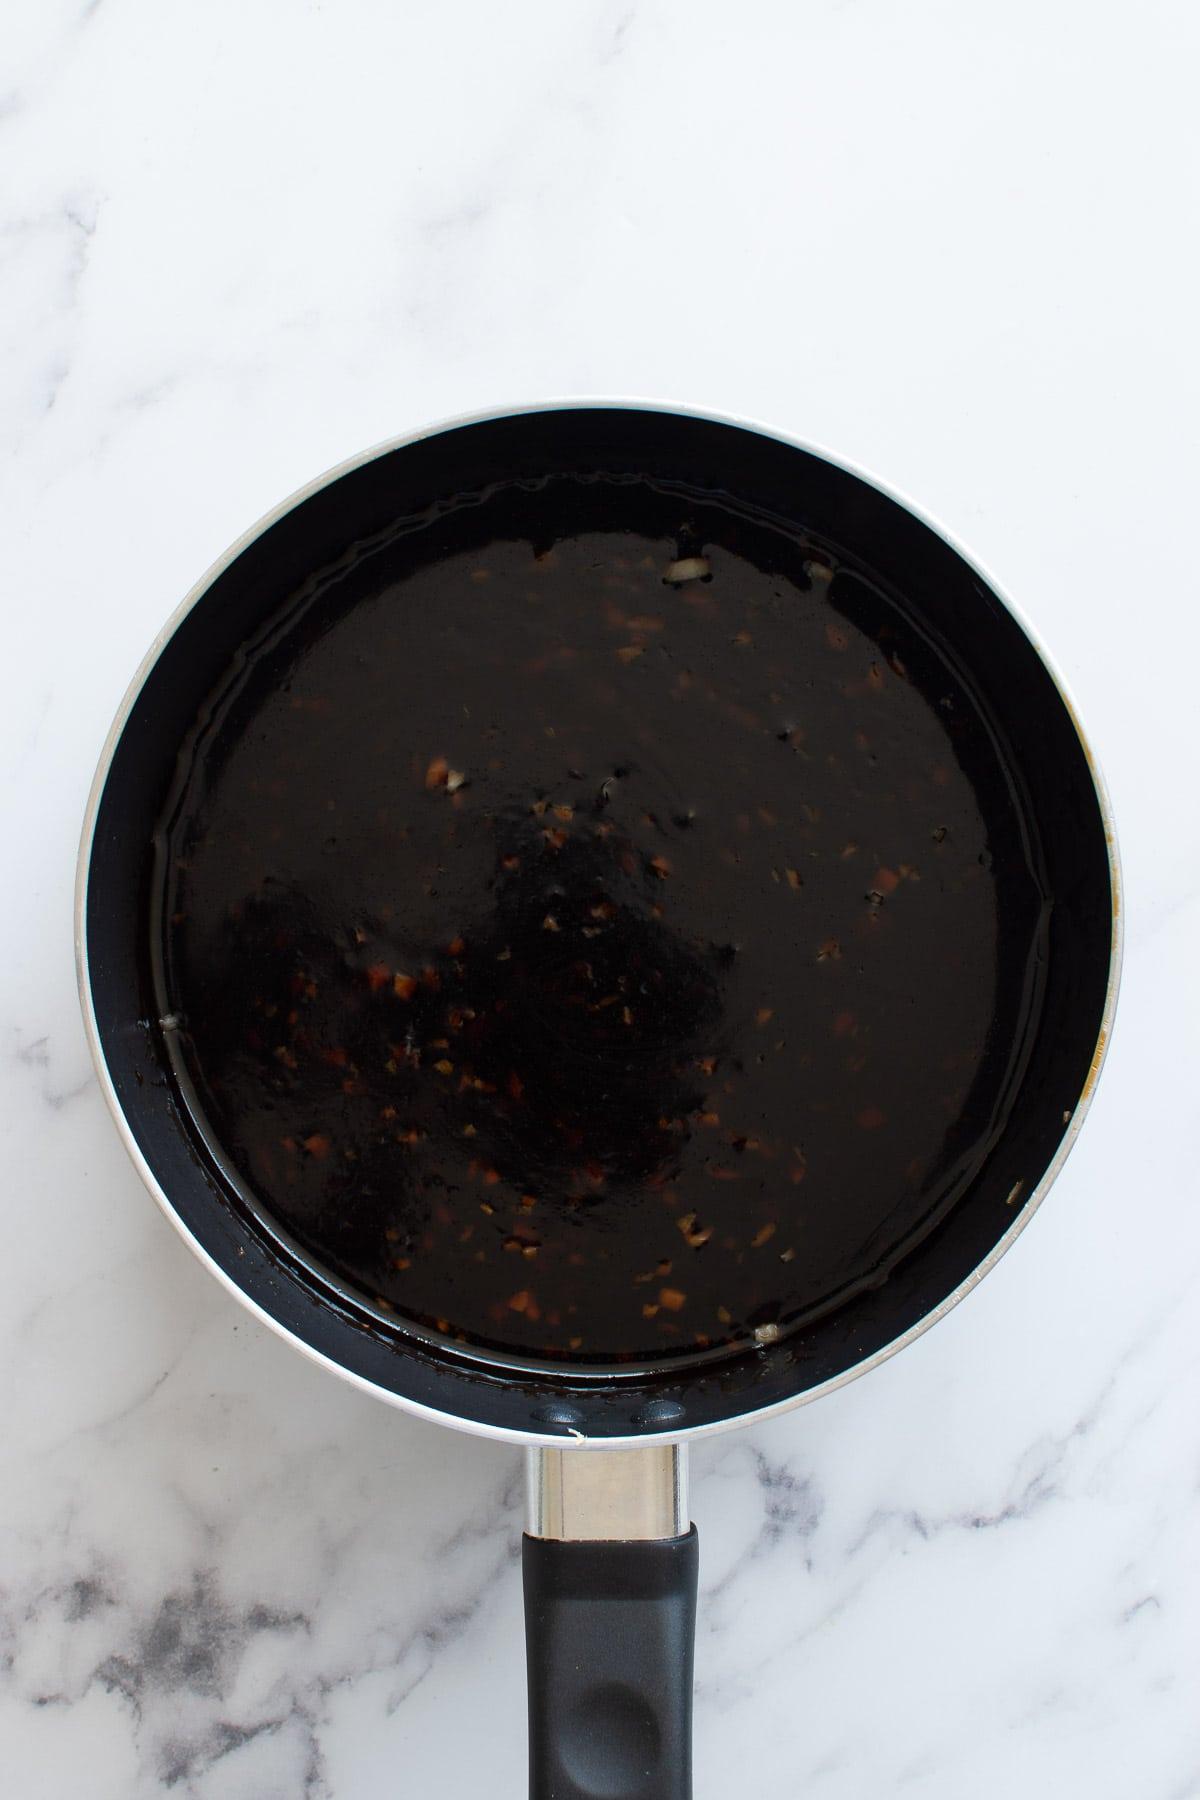 Cooking teriyaki sauce in a pot.